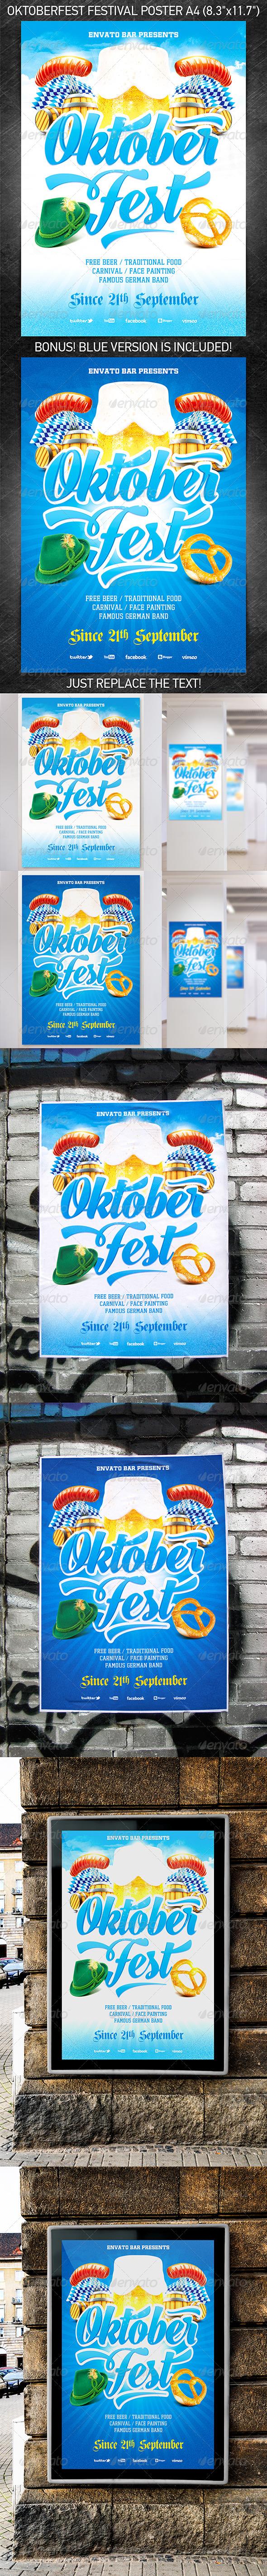 GraphicRiver Oktoberfest Festival Poster Vol.2 5425209